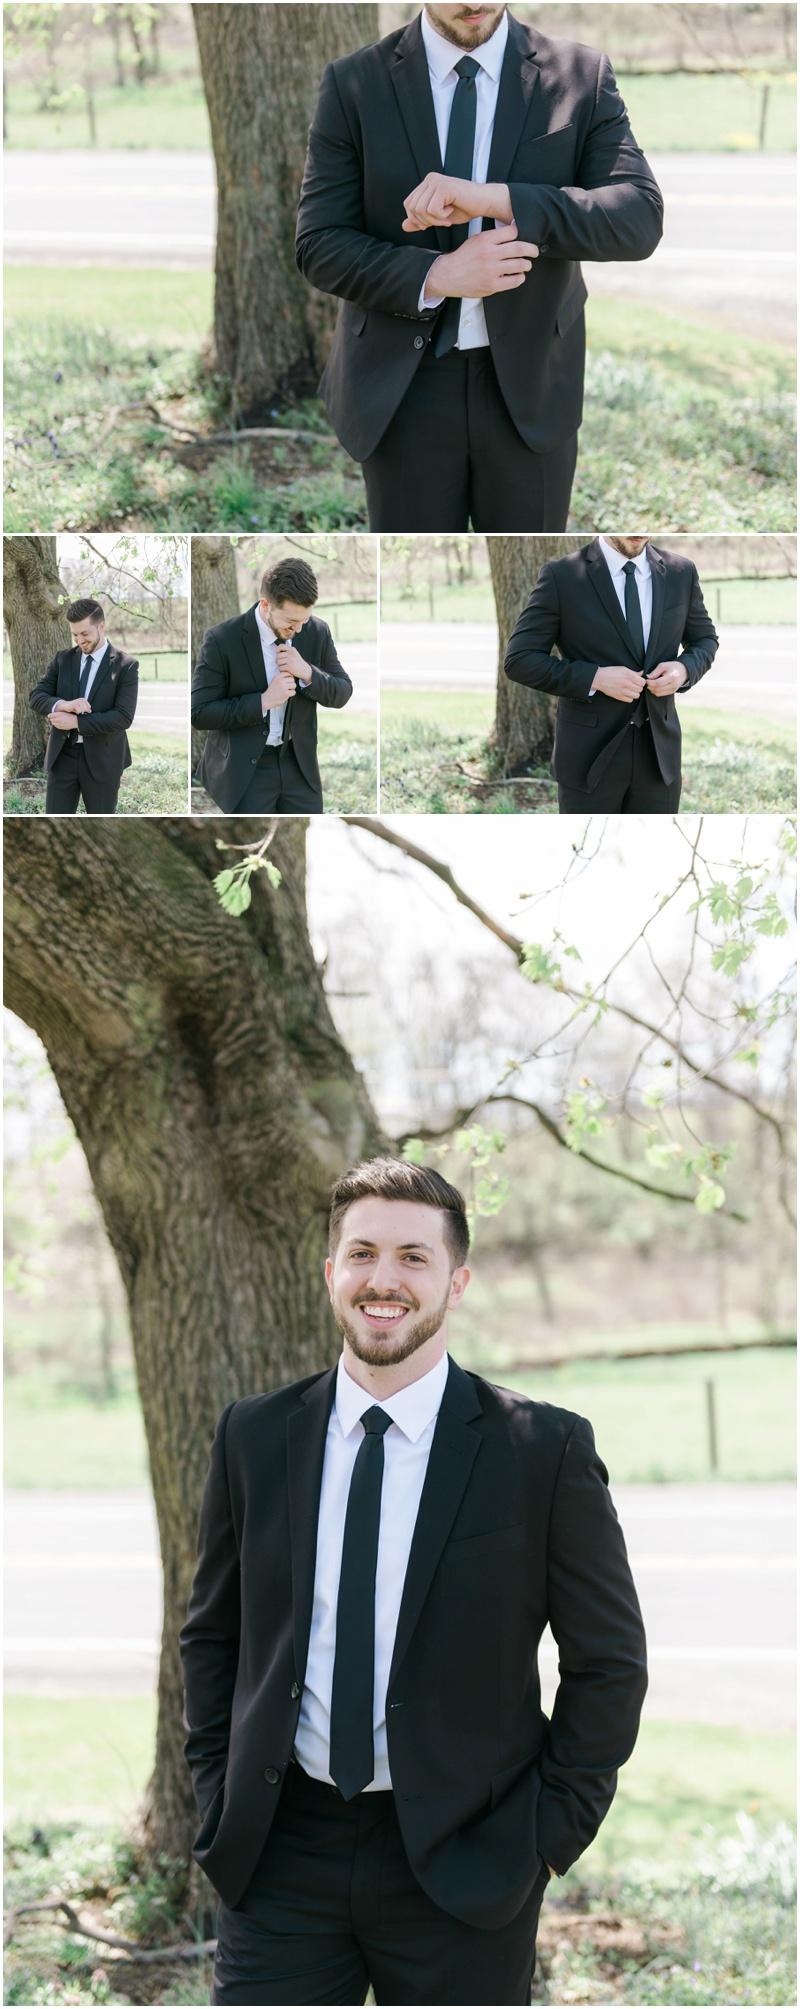 Heckman-Hayhurst Wedding-24.jpg